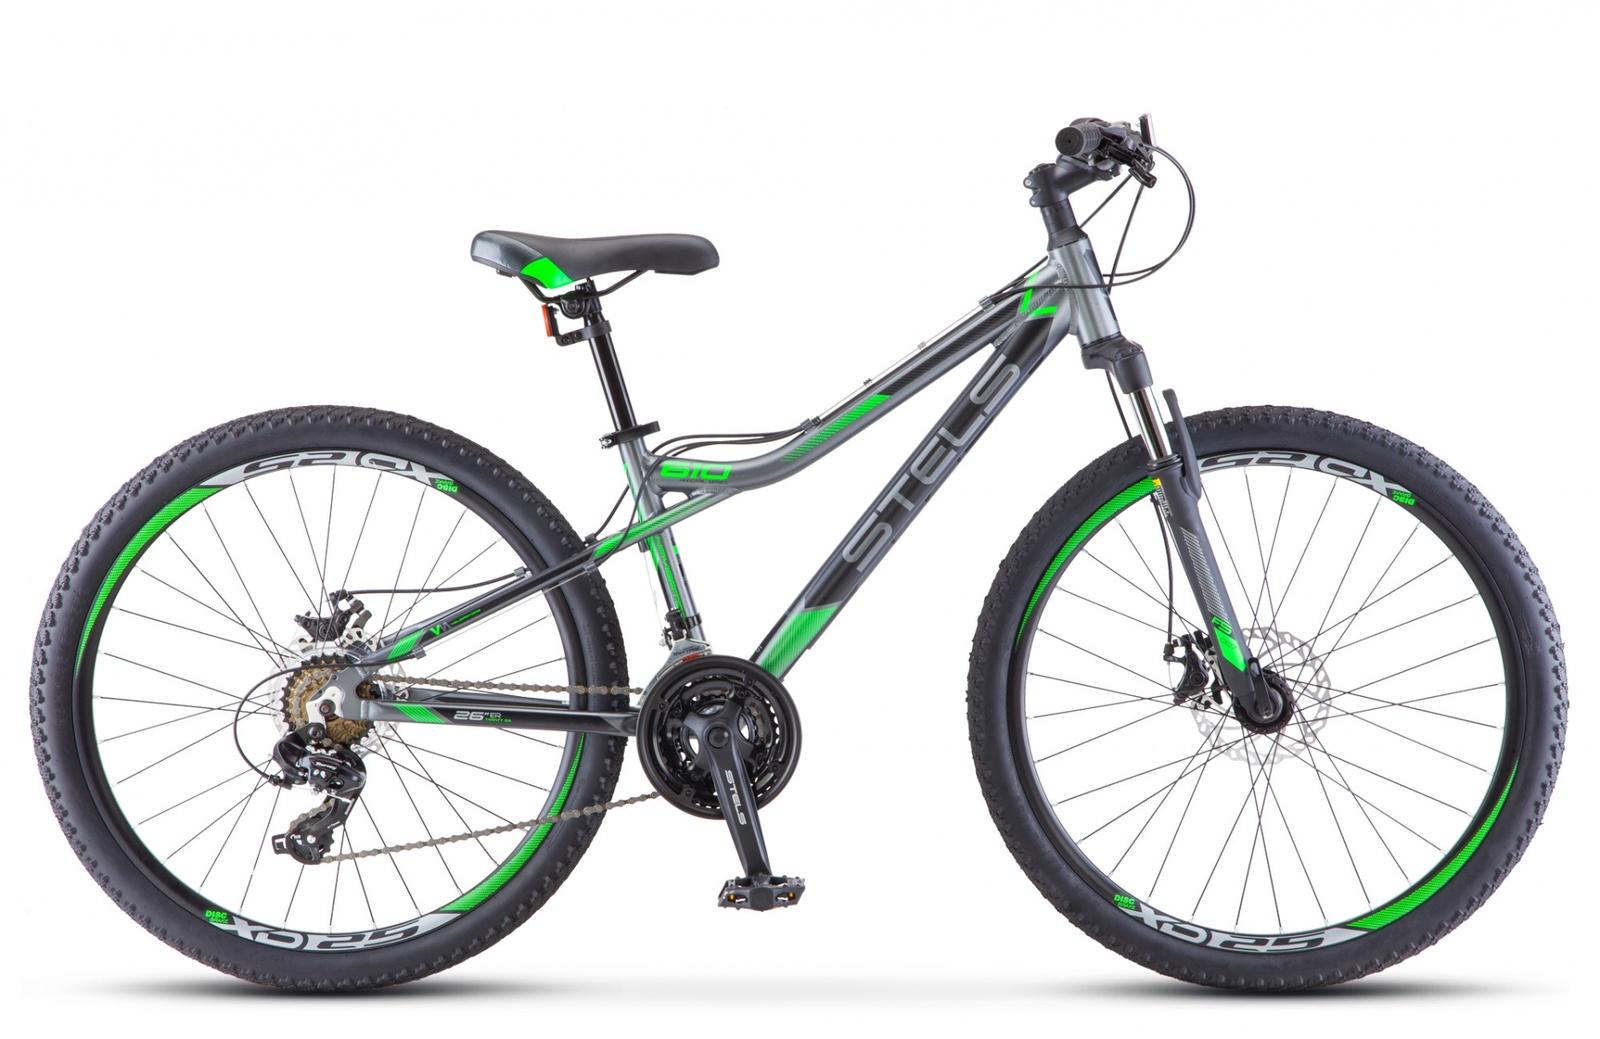 Велосипед Navigator 610 MD 26 V040 (2018), рама 16 дюймов велосипед stels navigator 610 v v030 2018